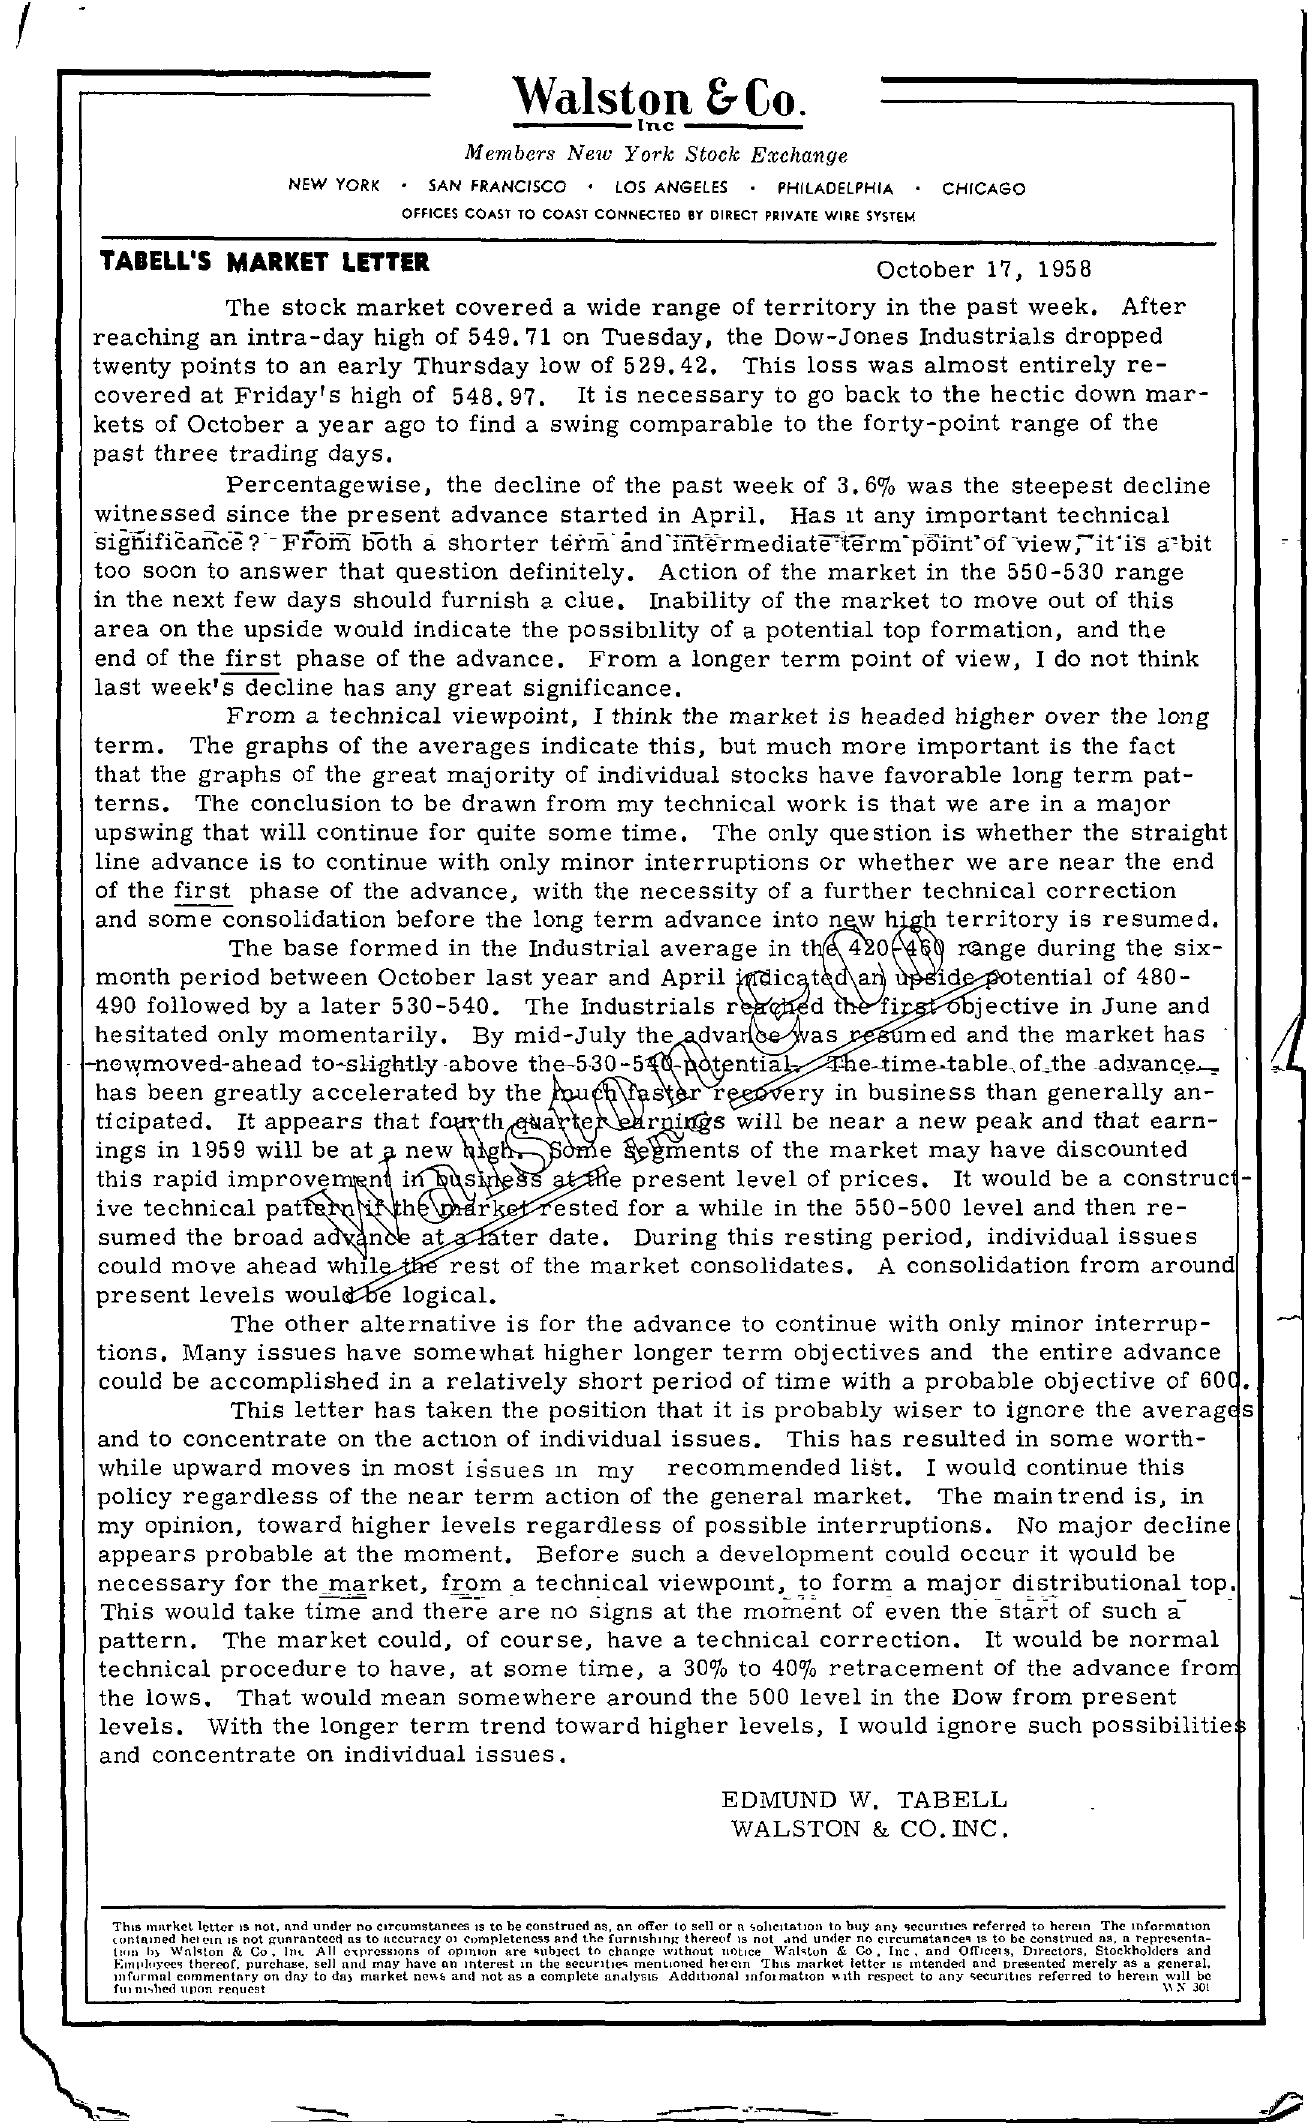 Tabell's Market Letter - October 17, 1958